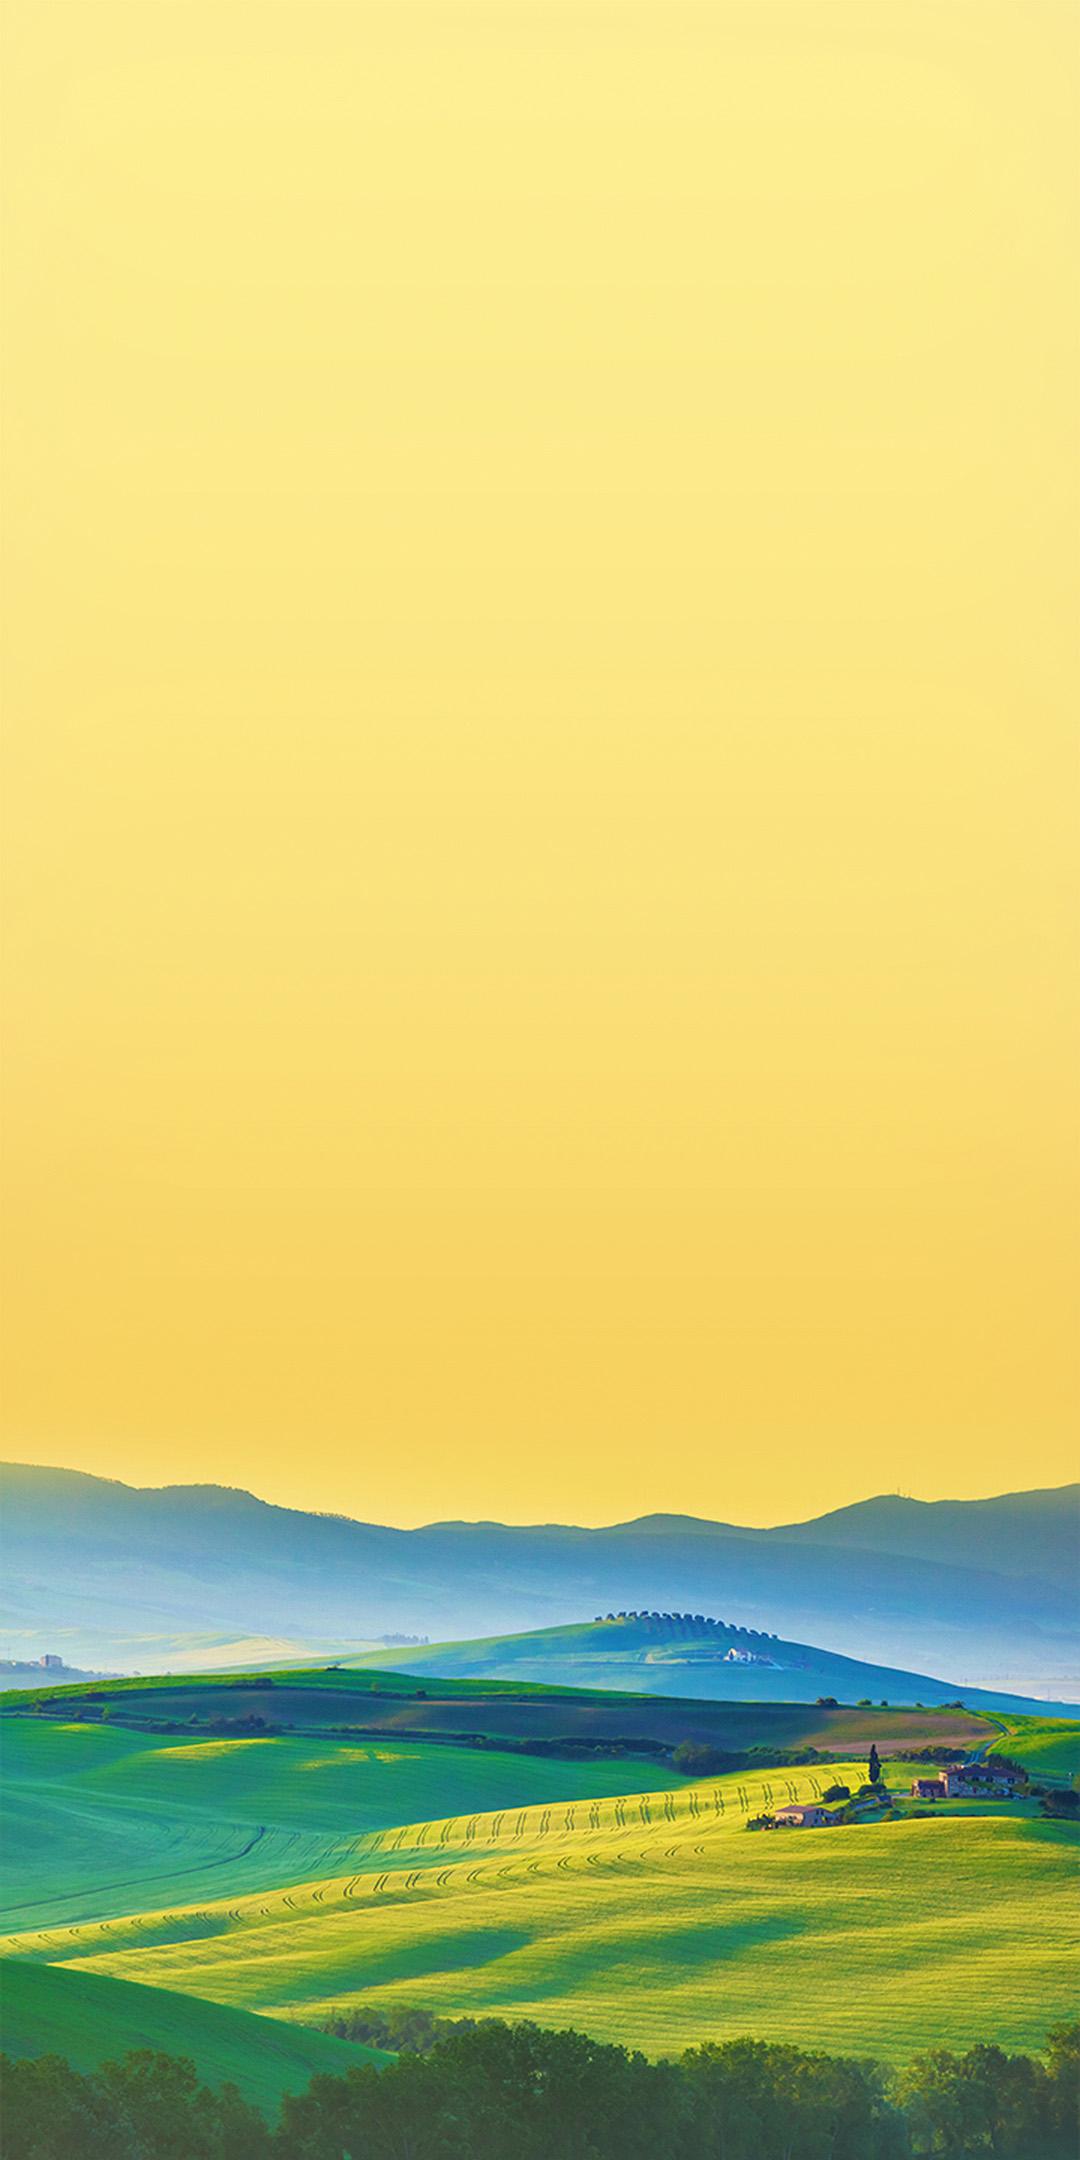 1080×2160 wallpaper: LG Q6 Stock Wallpaper 14